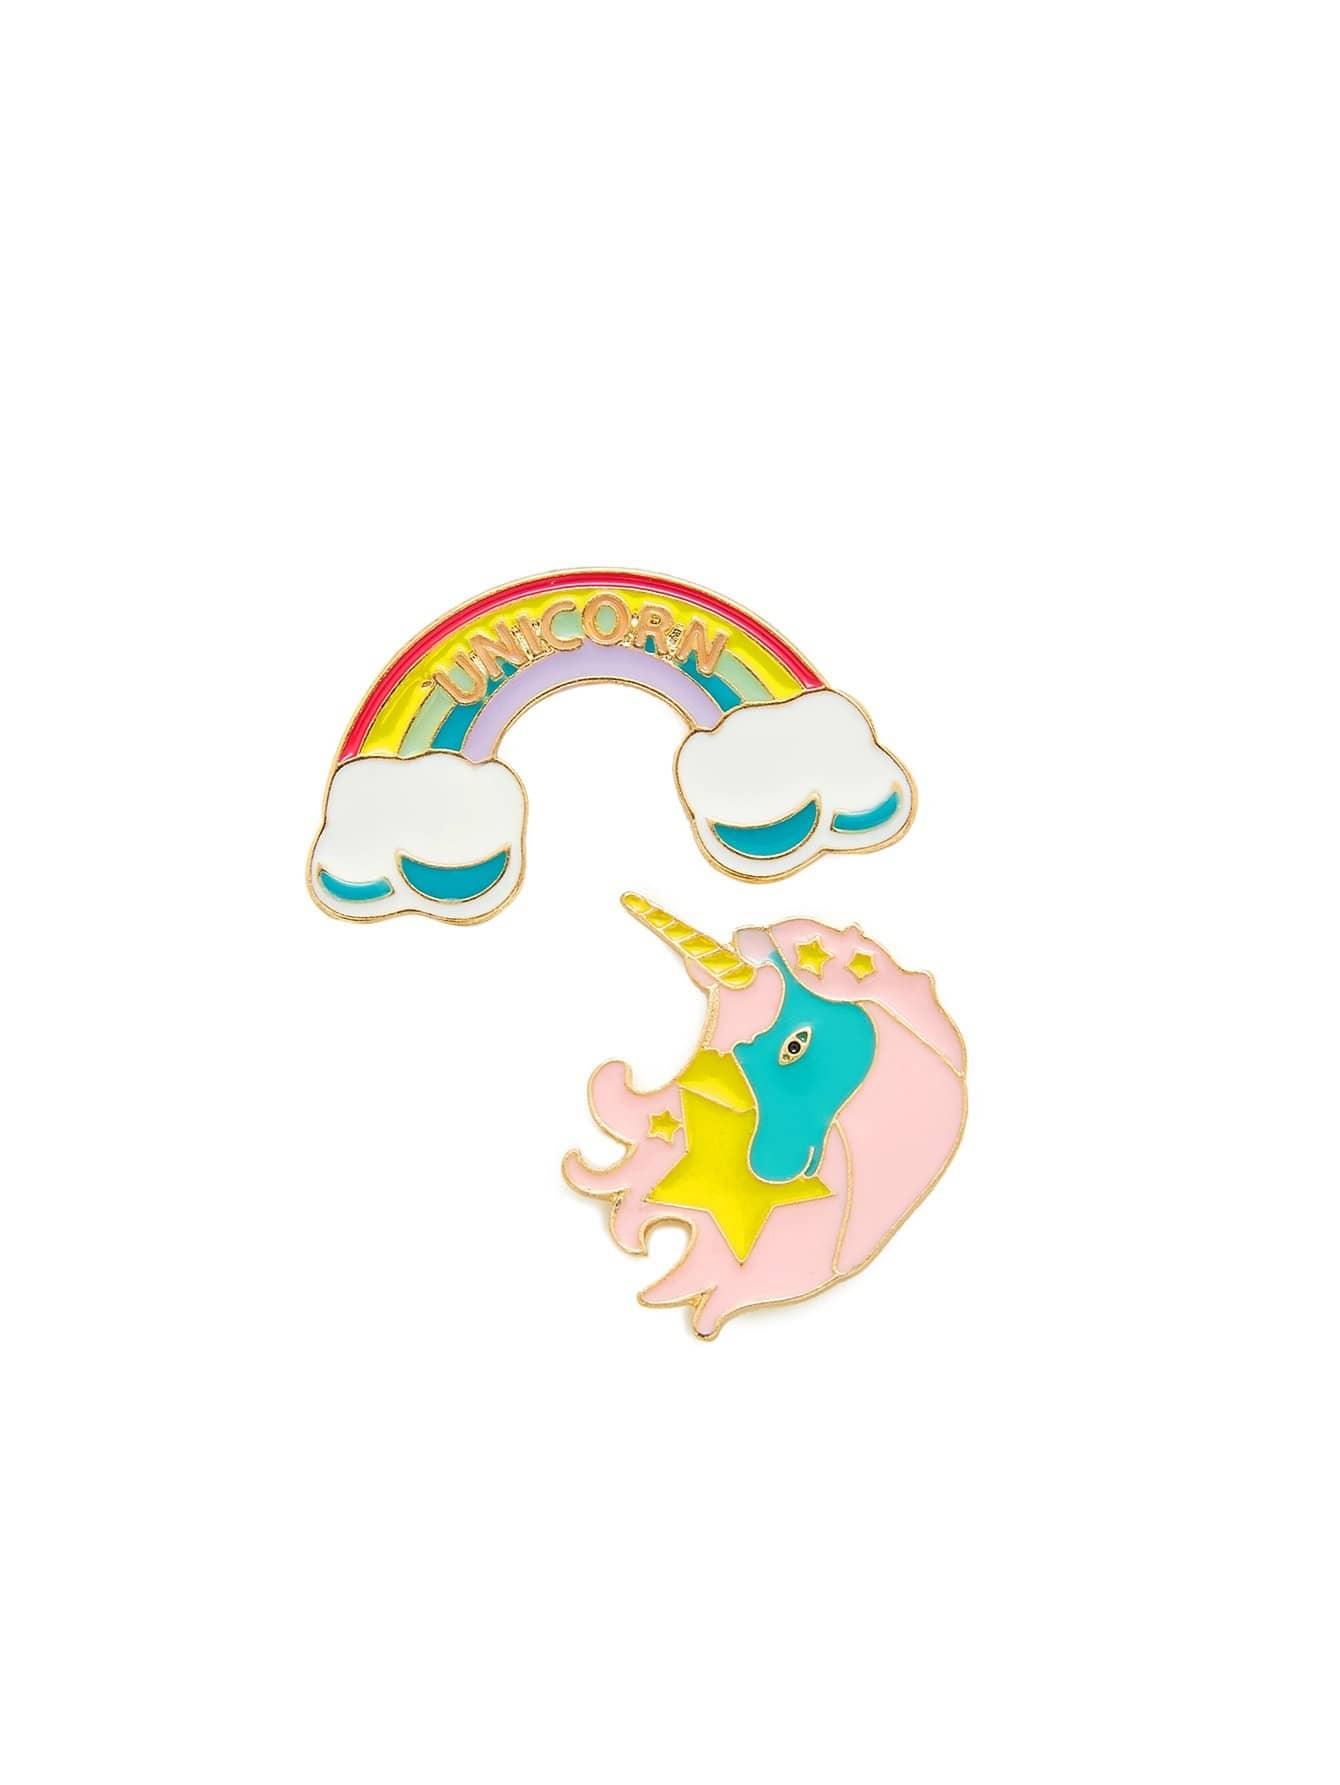 Rainbow & Unicorn Design Brooch Set pineapple rainbow watermelon glasses brooch set